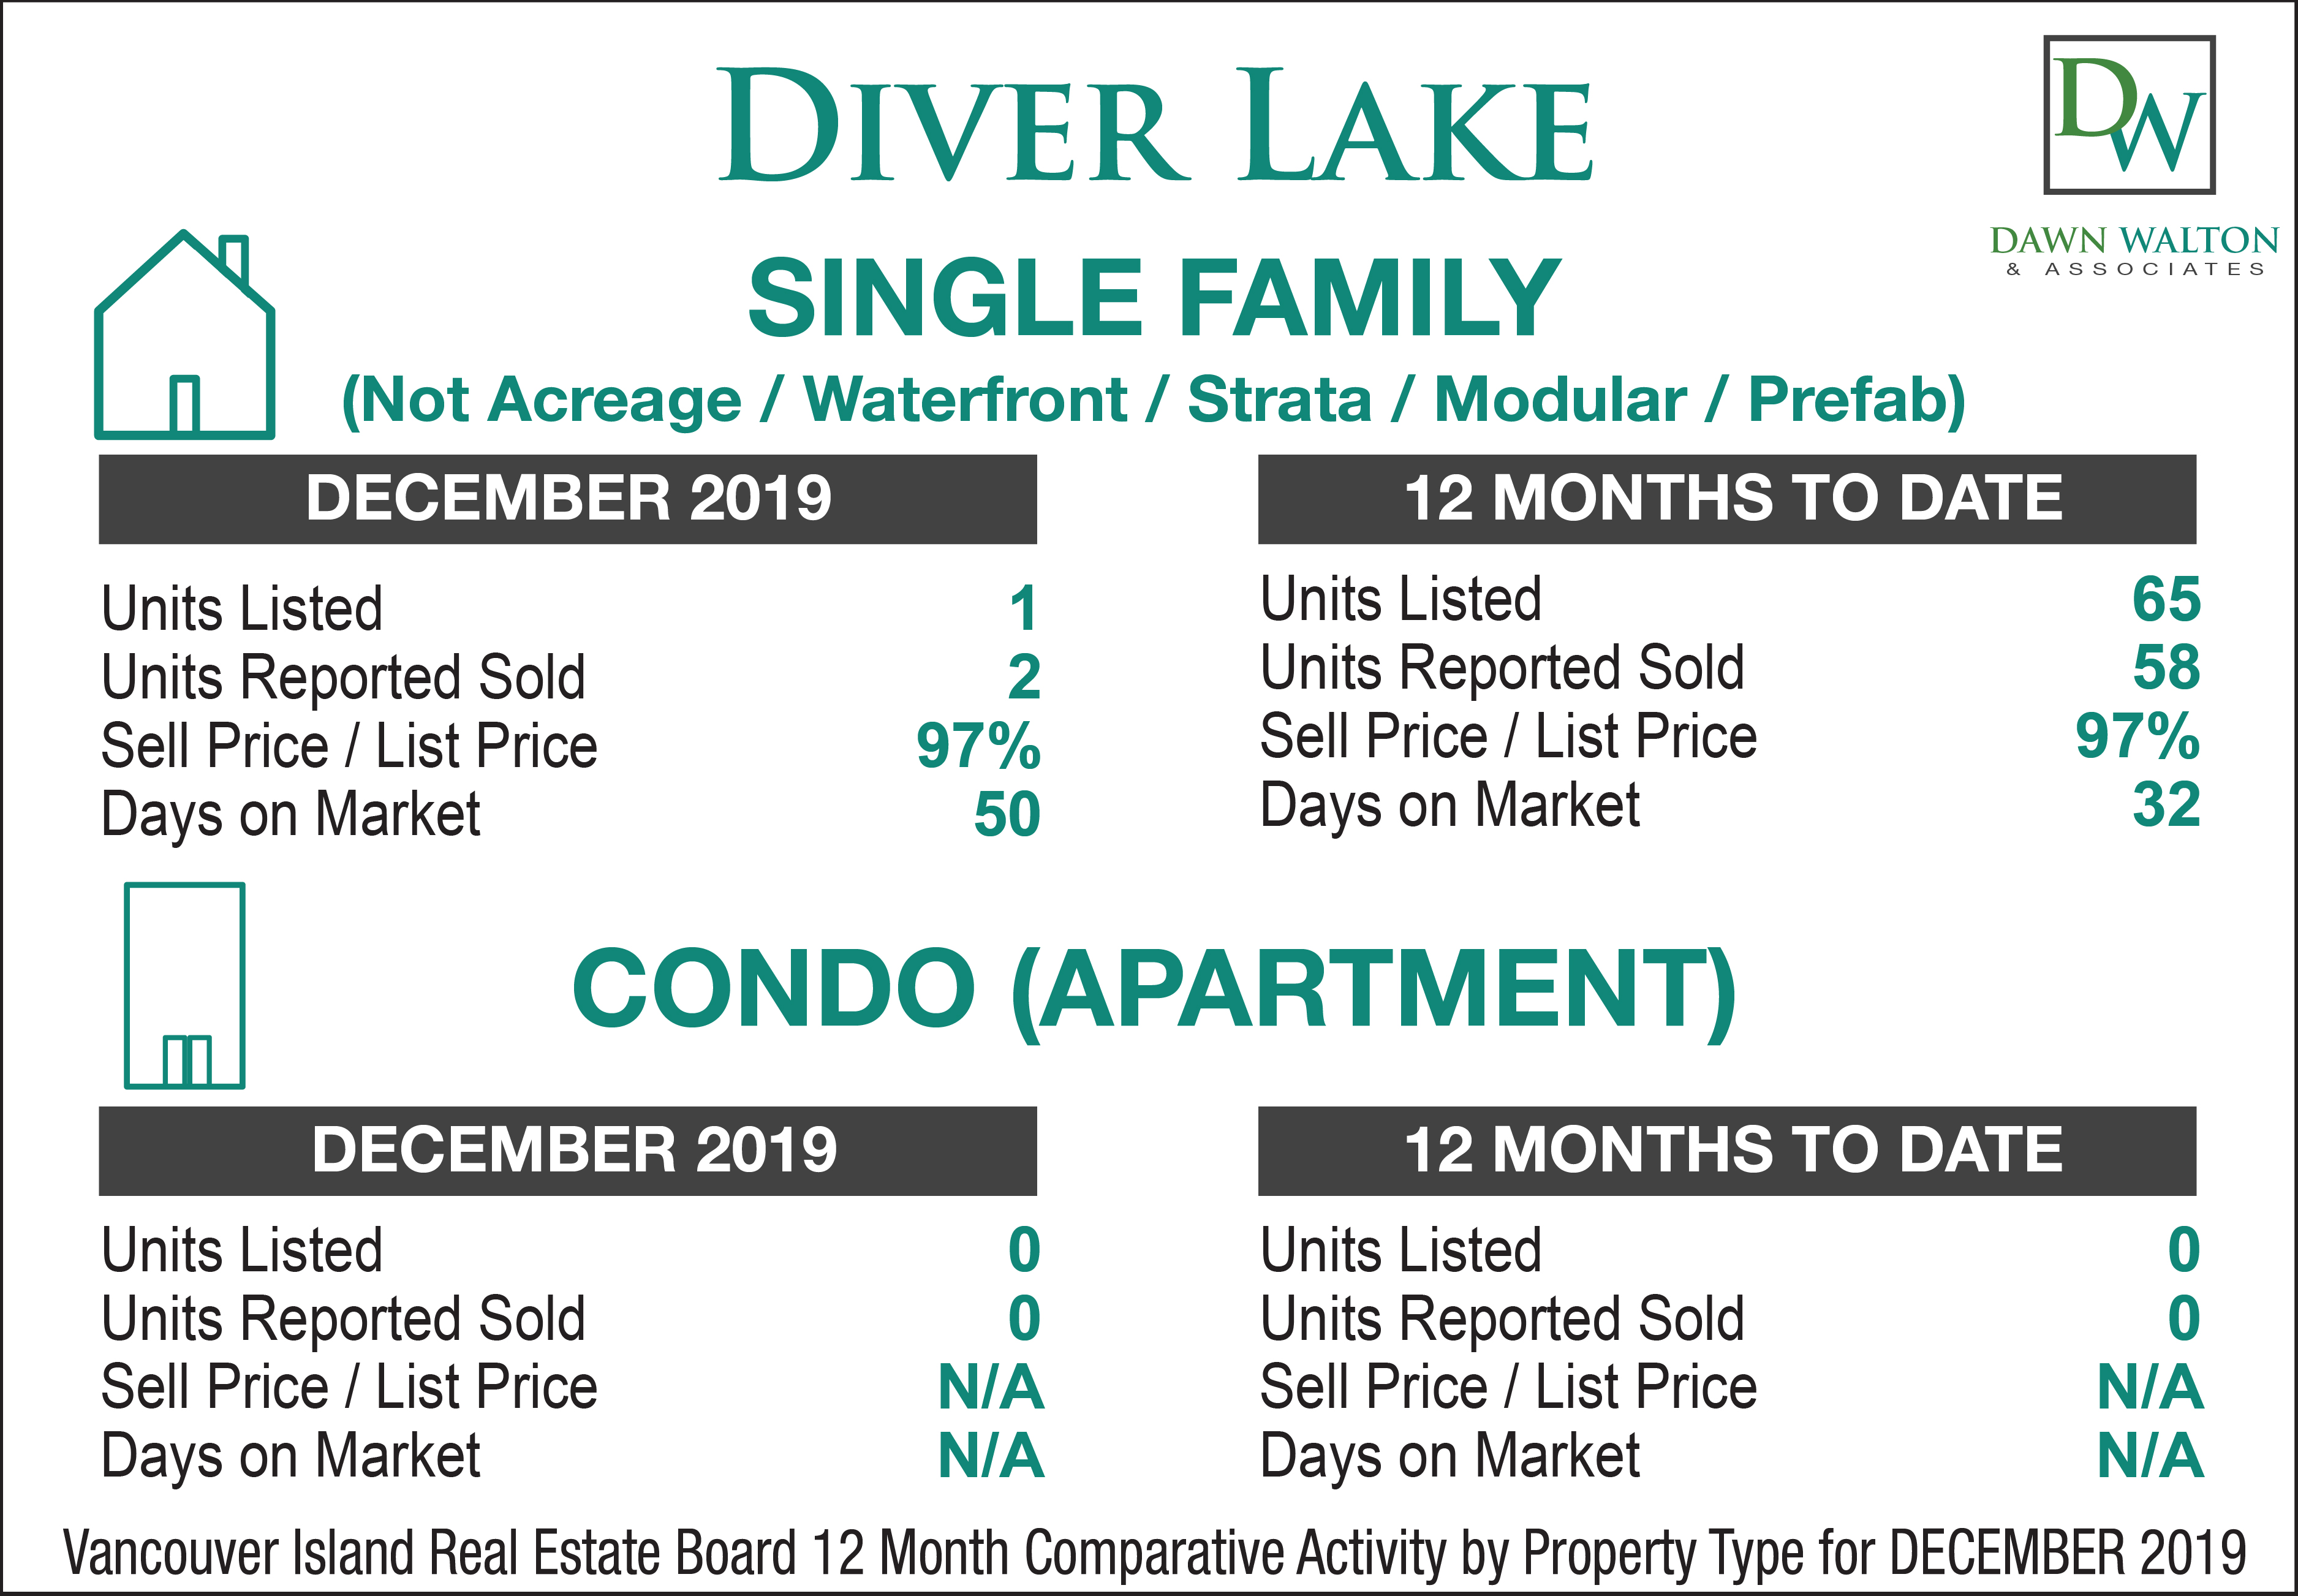 Diver Lake Real Estate Market Stats December  2019 - Nanaimo Realtor Dawn Walton